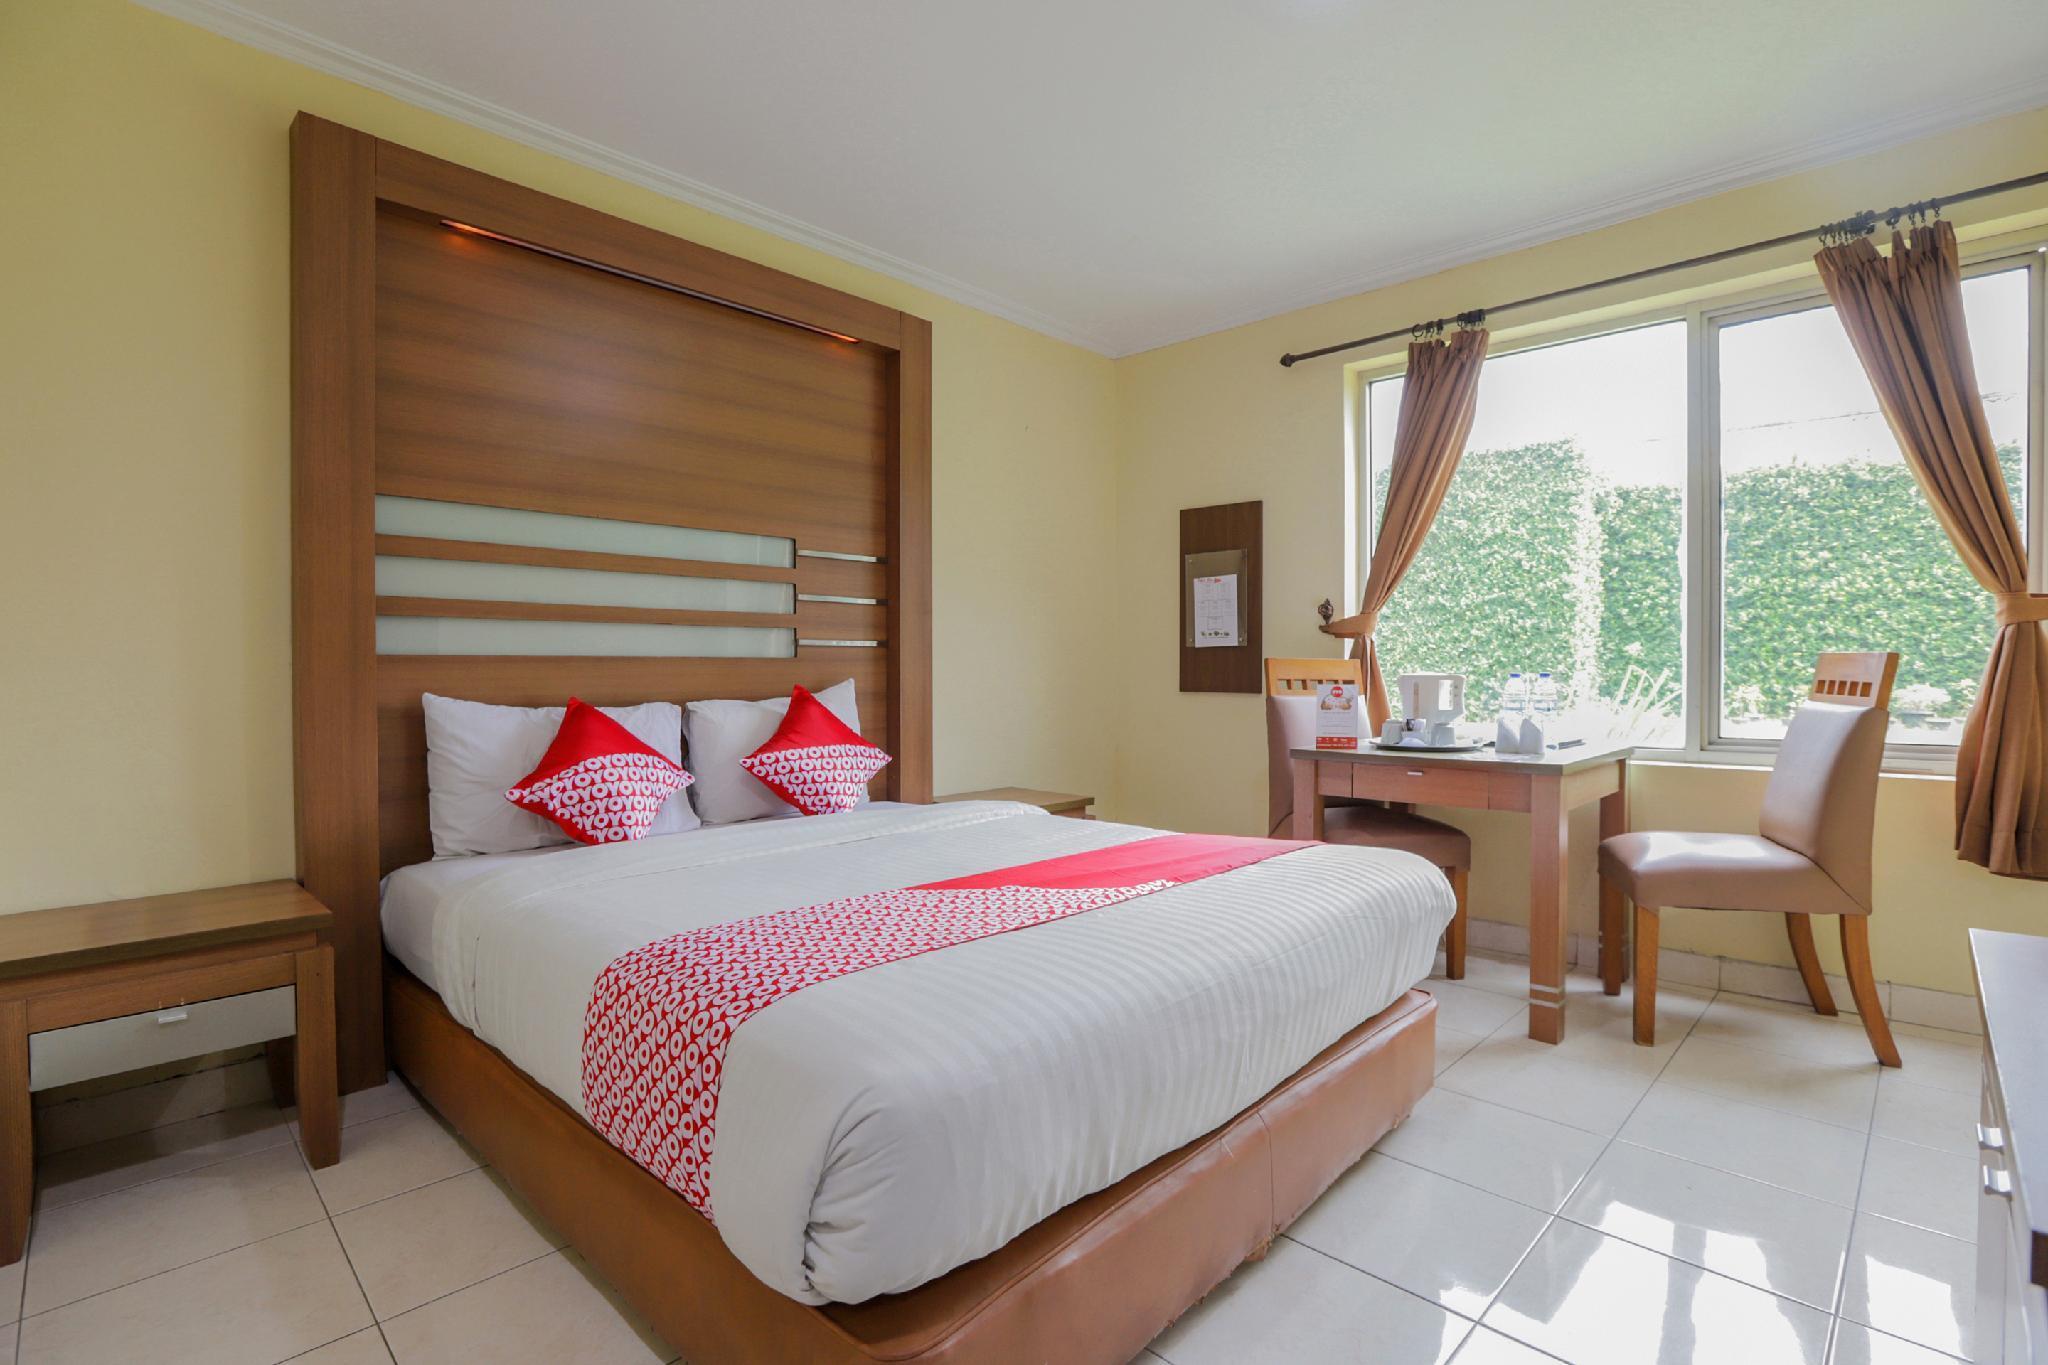 Oyo 918 Hotel Senen Indah Syariah Near Rs Darmais Jakarta Offers Free Cancellation 2021 Price Lists Reviews